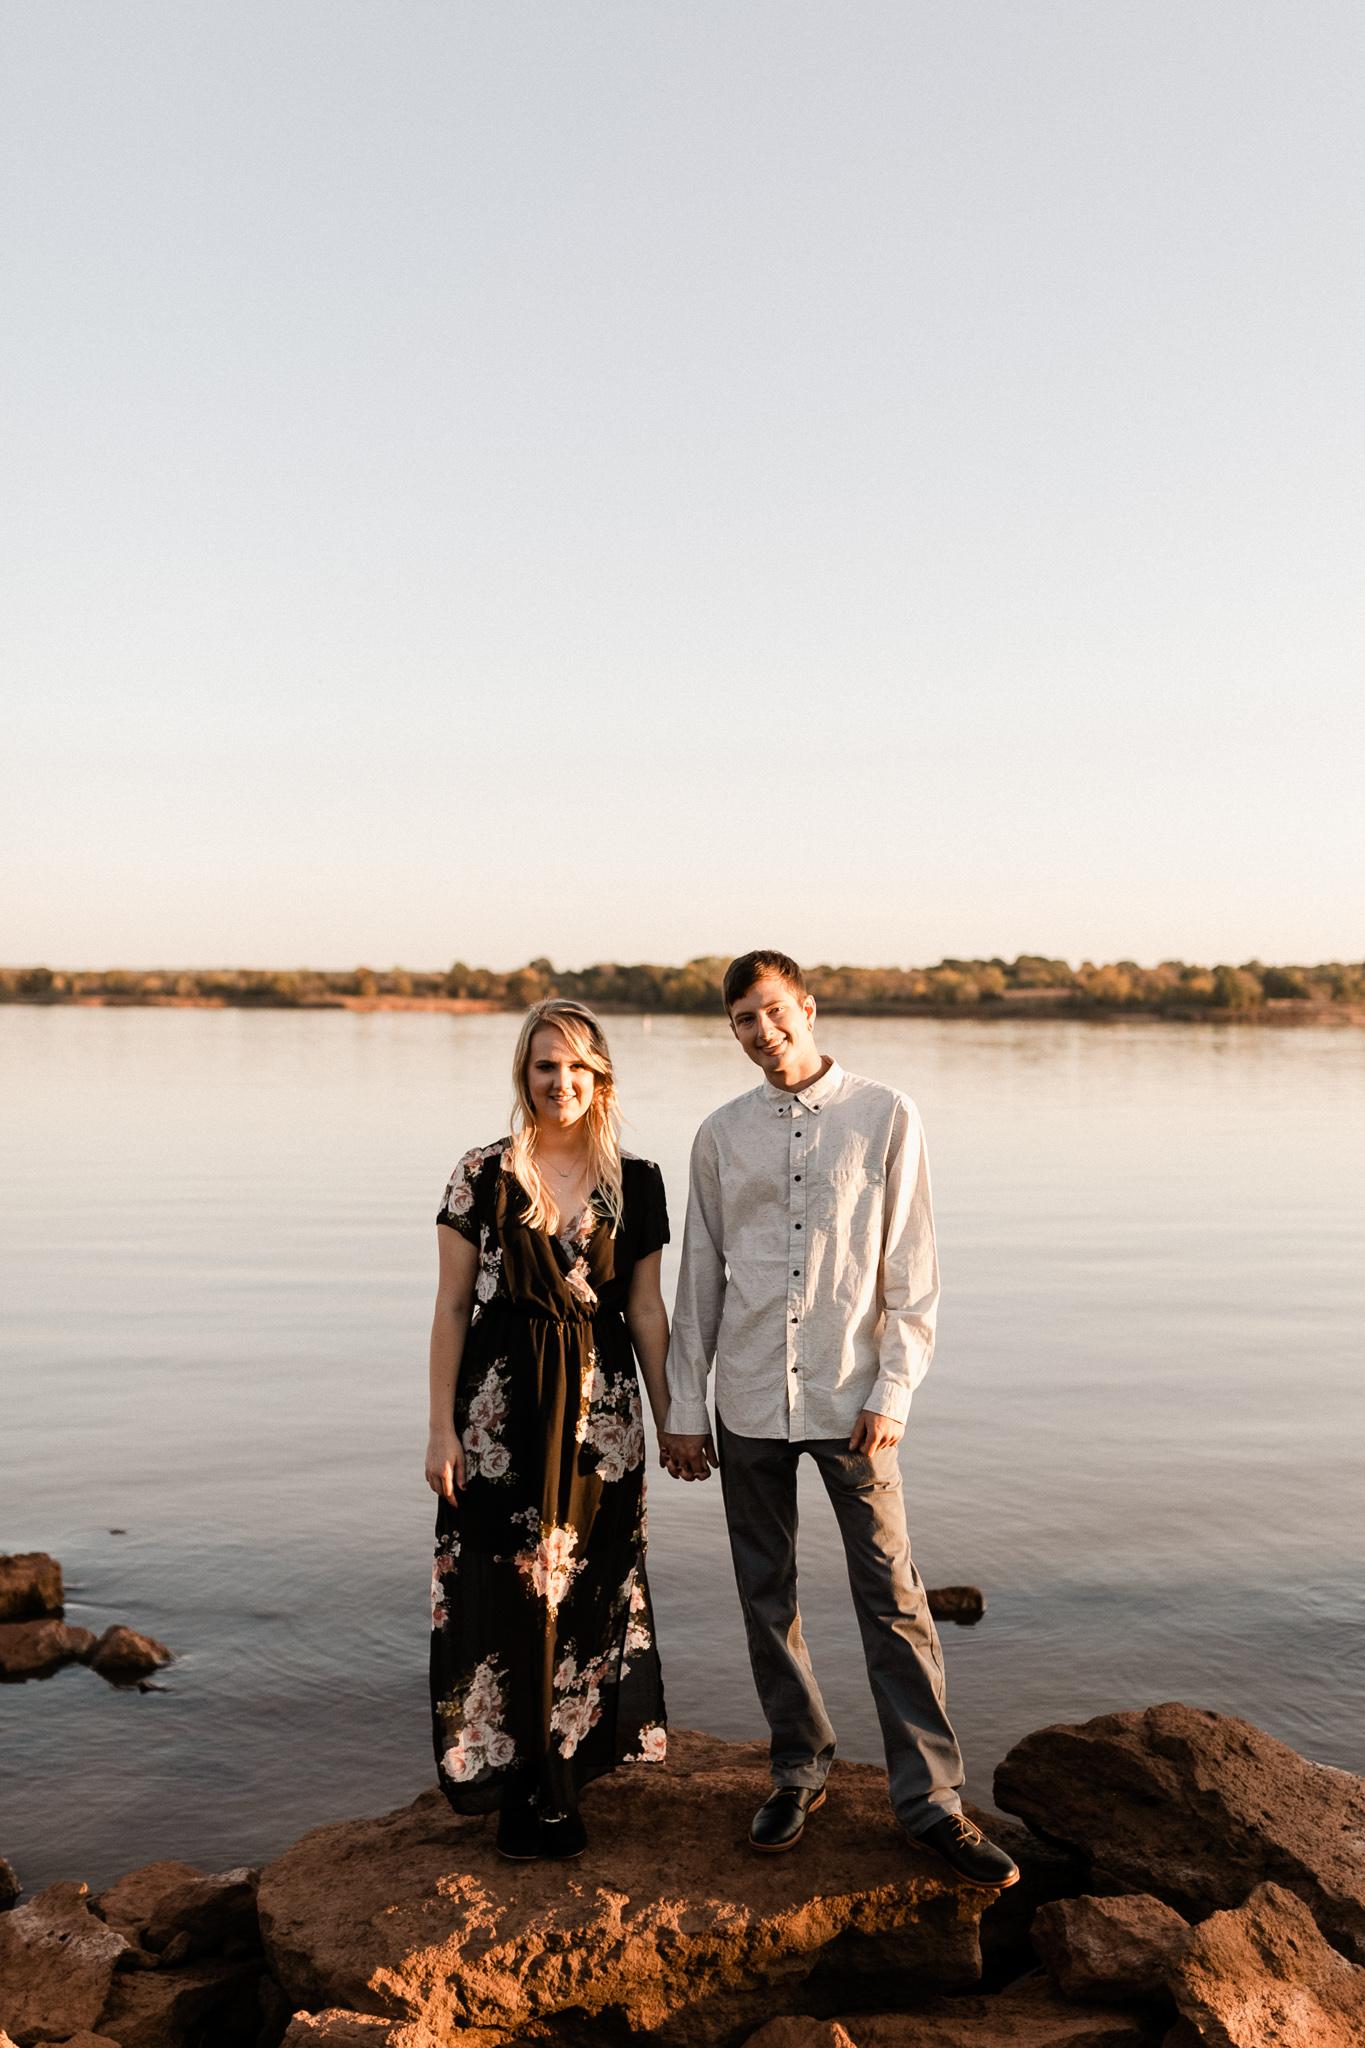 Kyle + Brittany   Fall Lake Engagement Photos   Oklahoma Lifestyle Photographer-32.jpg